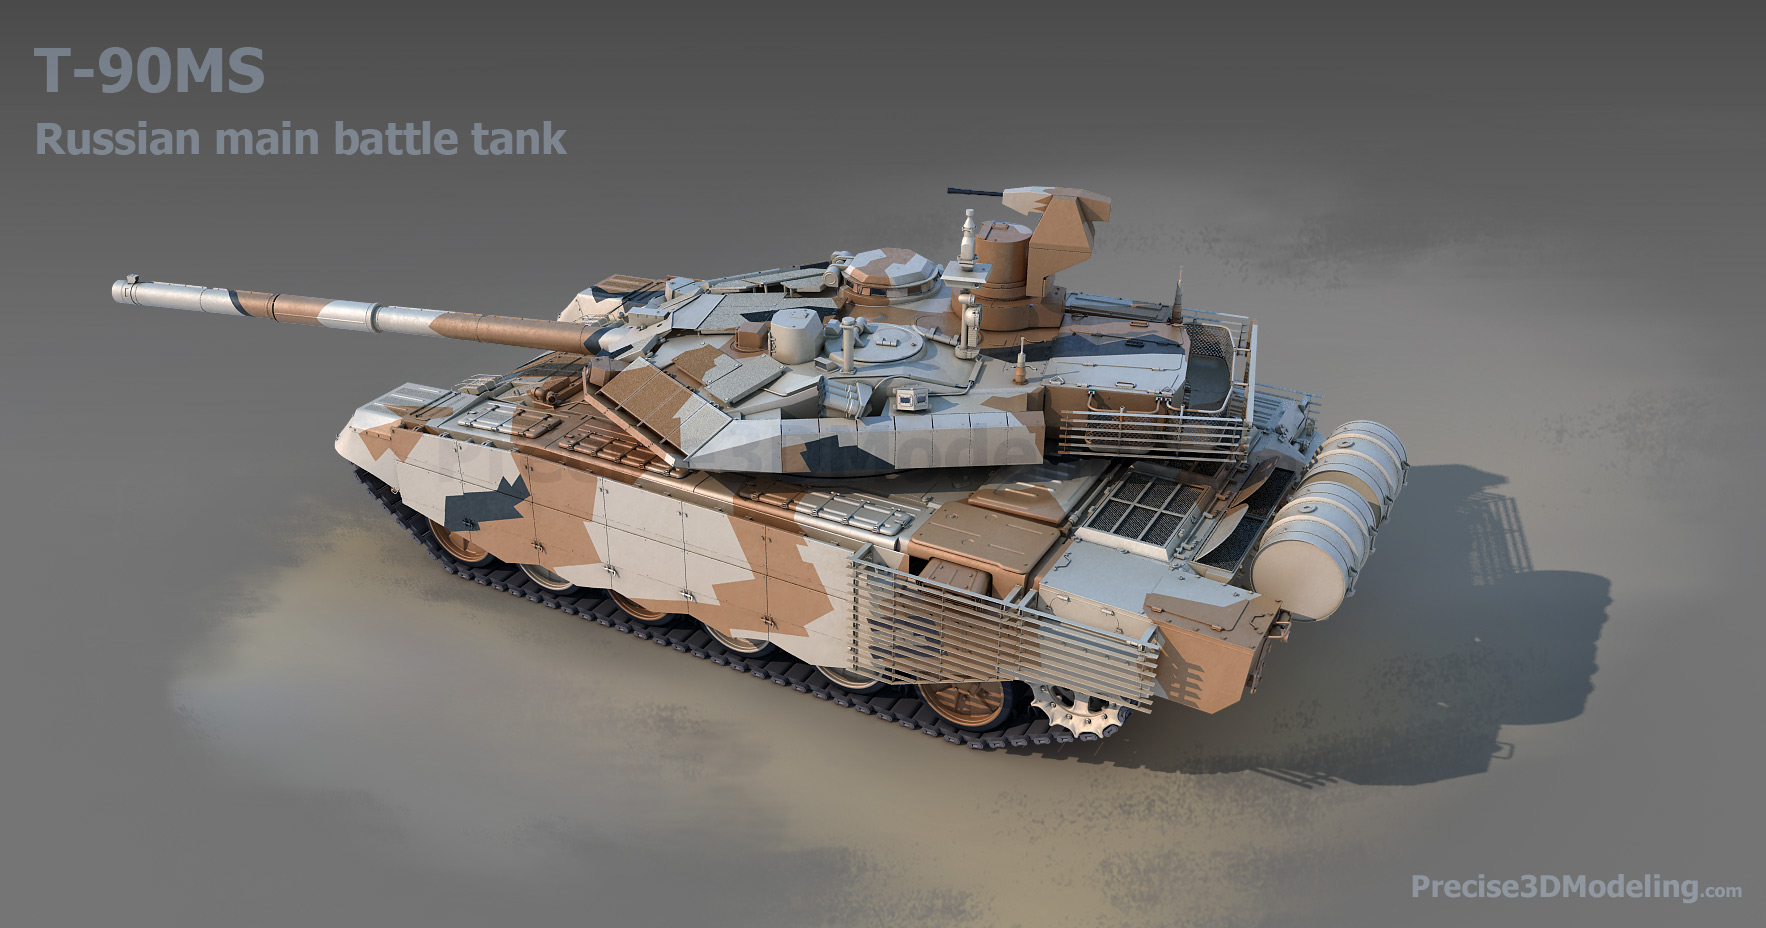 T-90MS_04_large.jpg